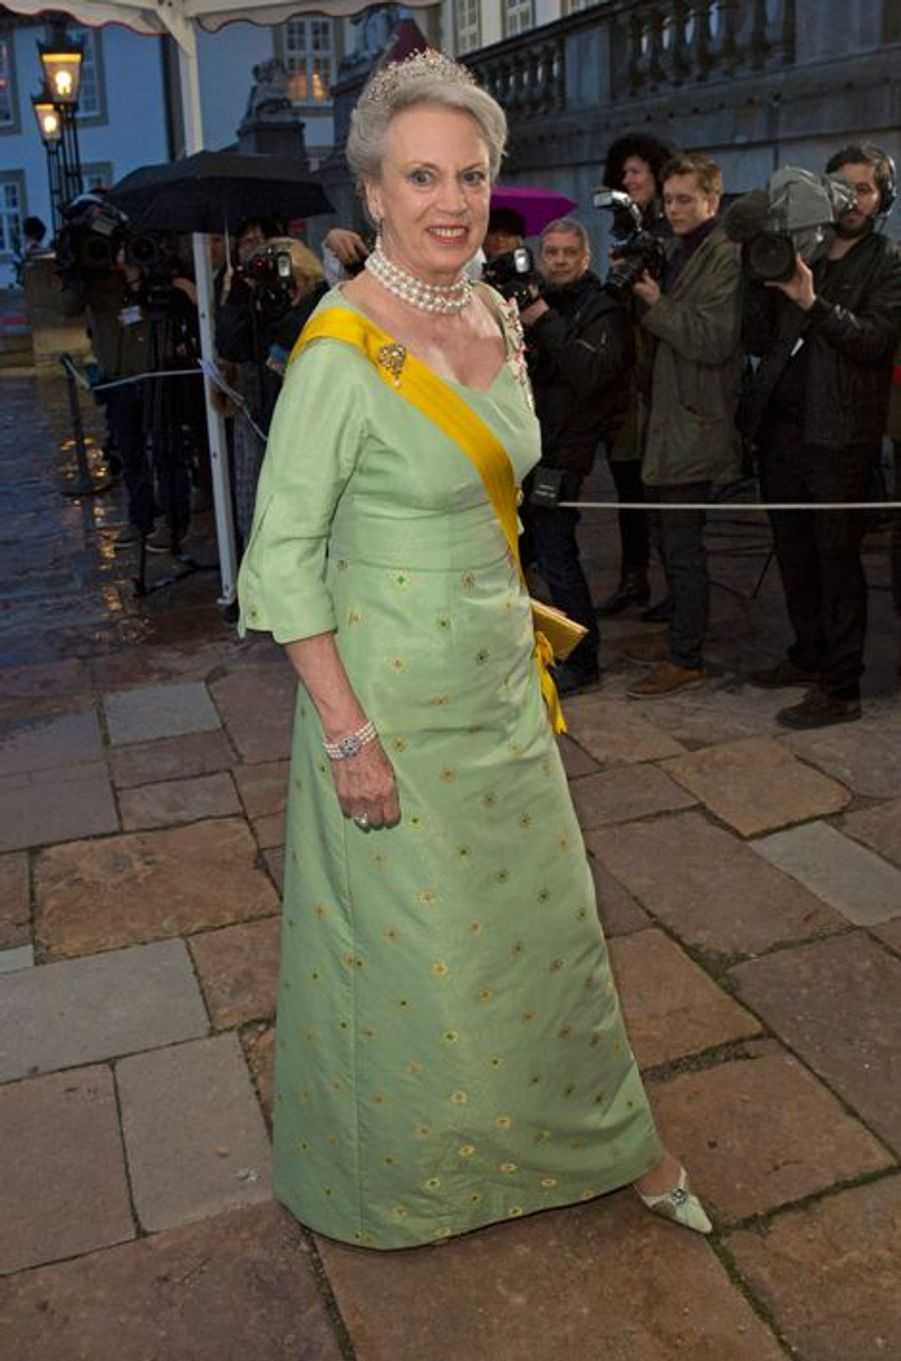 La princesse Benedikte de Danemark à Fredensborg, le 13 avril 2016